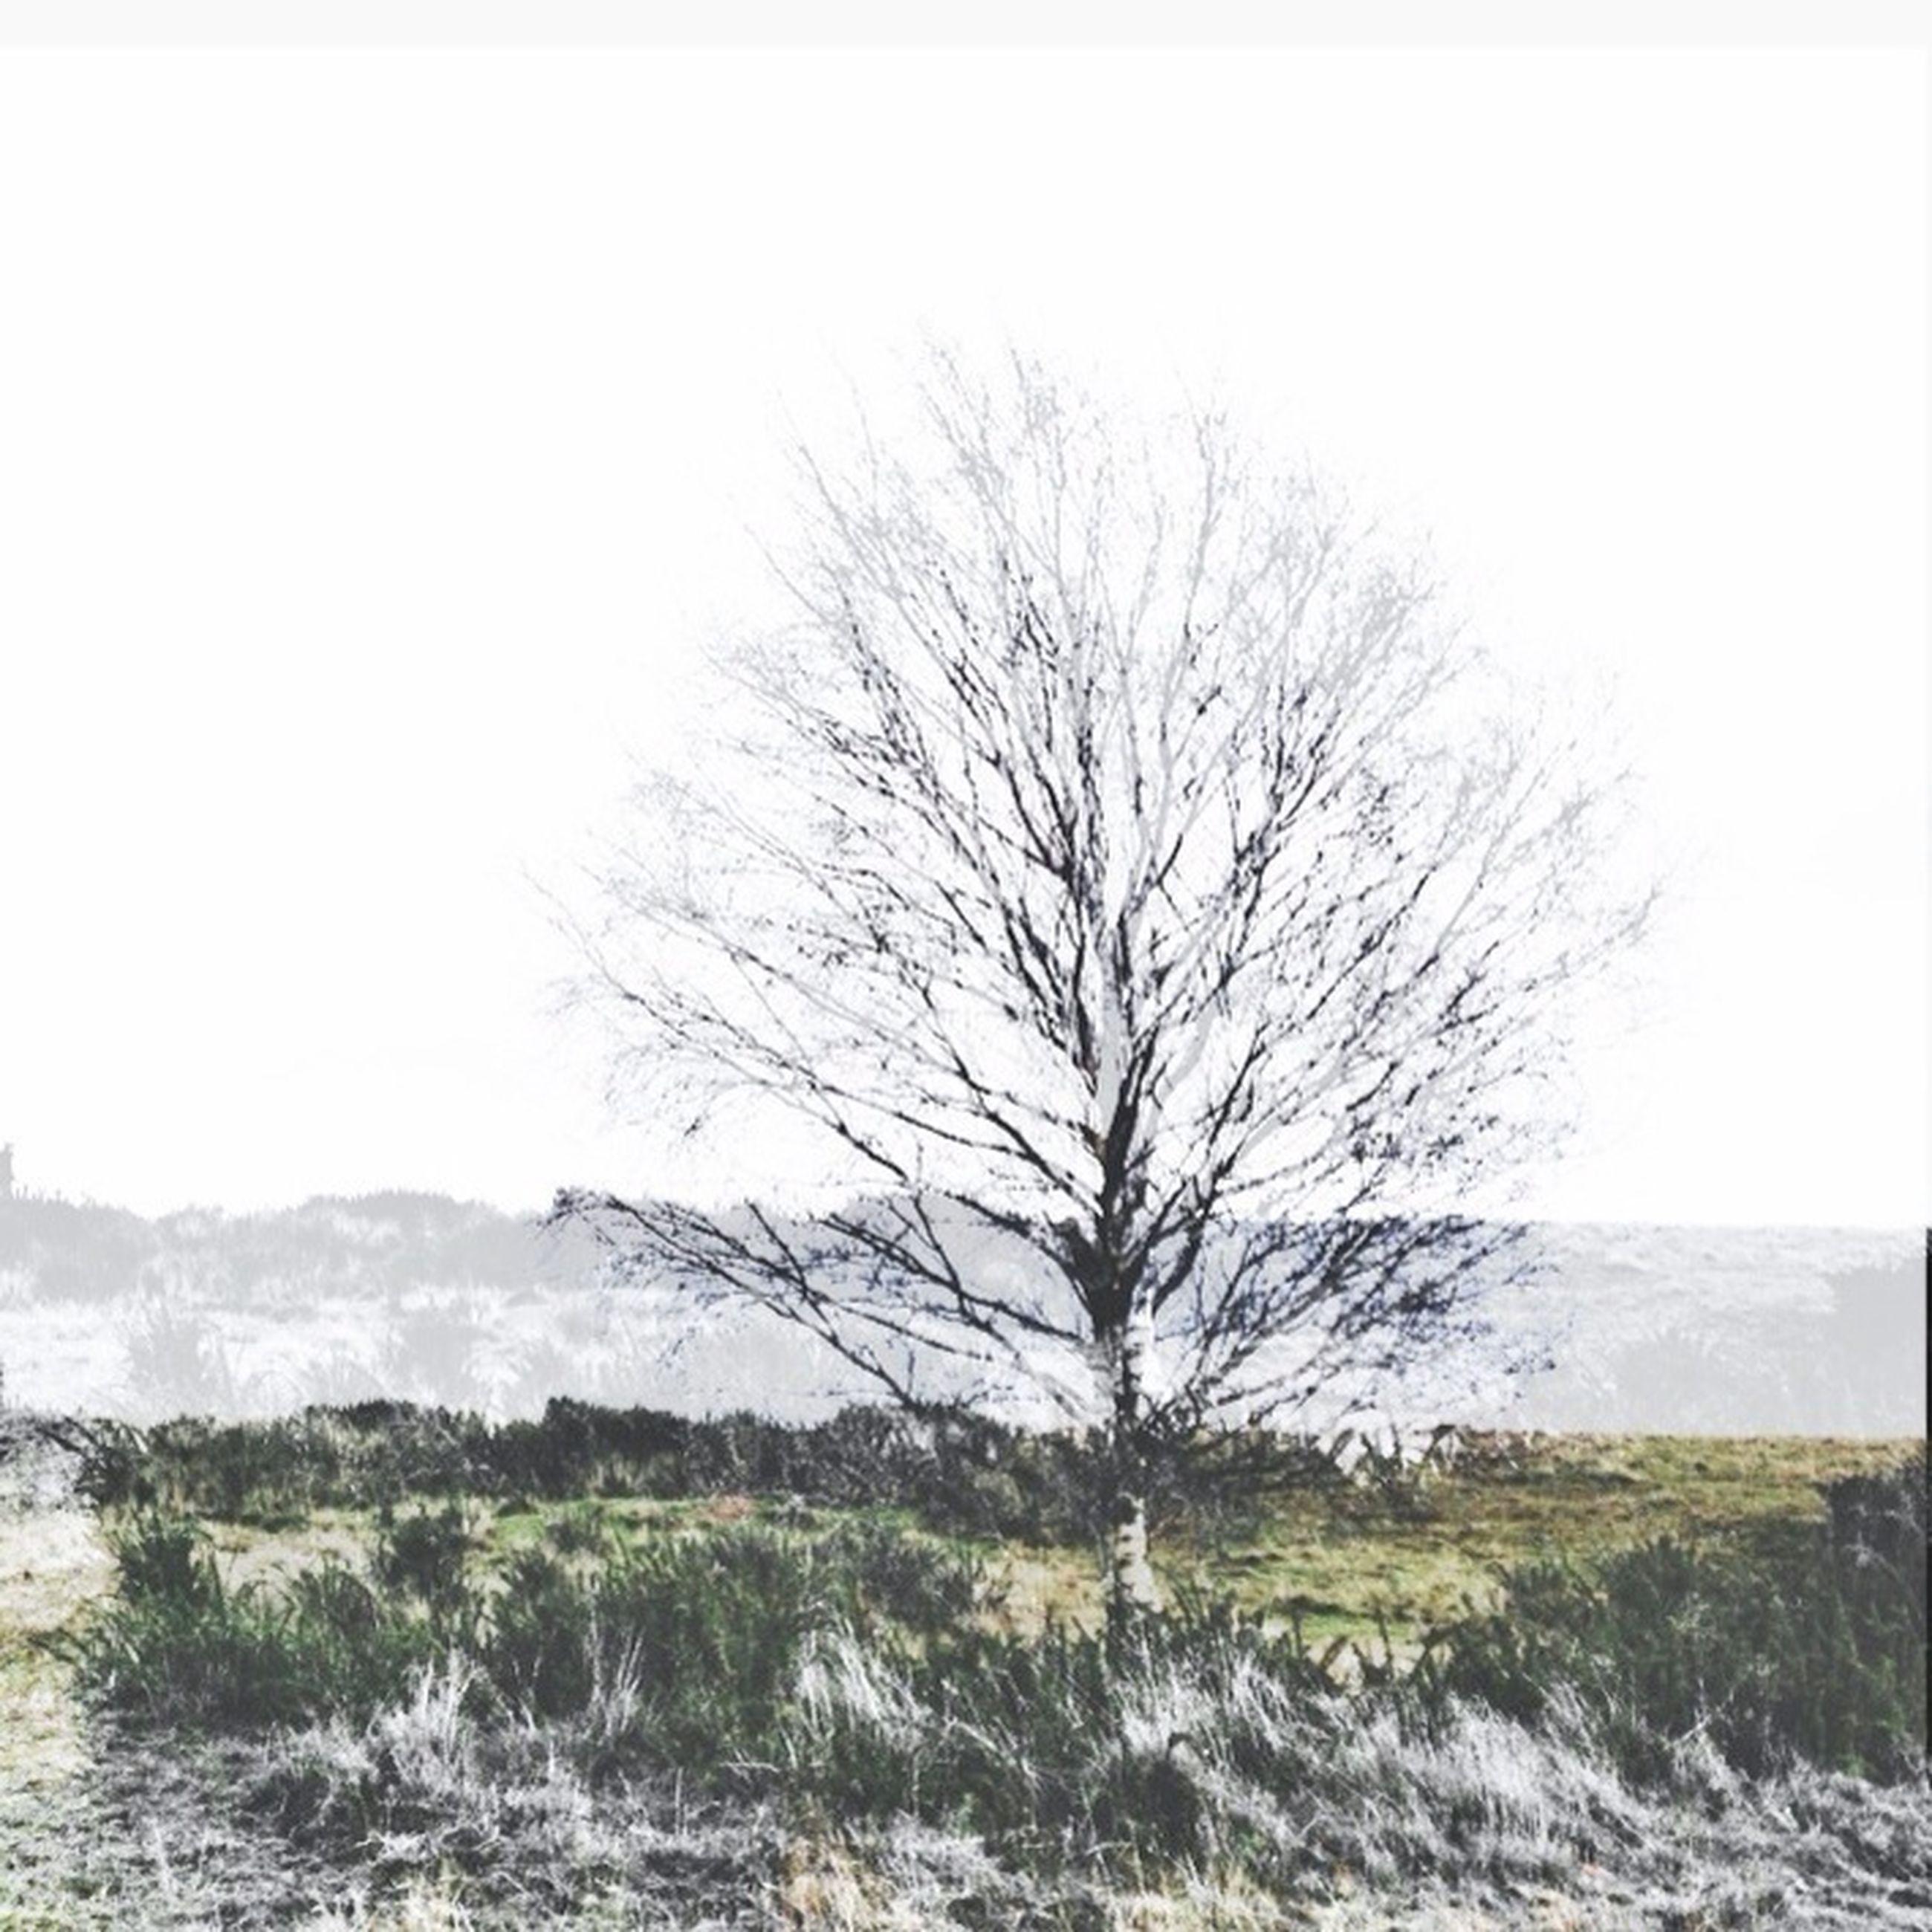 bare tree, clear sky, tranquility, landscape, tranquil scene, field, tree, scenics, nature, beauty in nature, winter, copy space, branch, cold temperature, non-urban scene, snow, grass, remote, weather, horizon over land